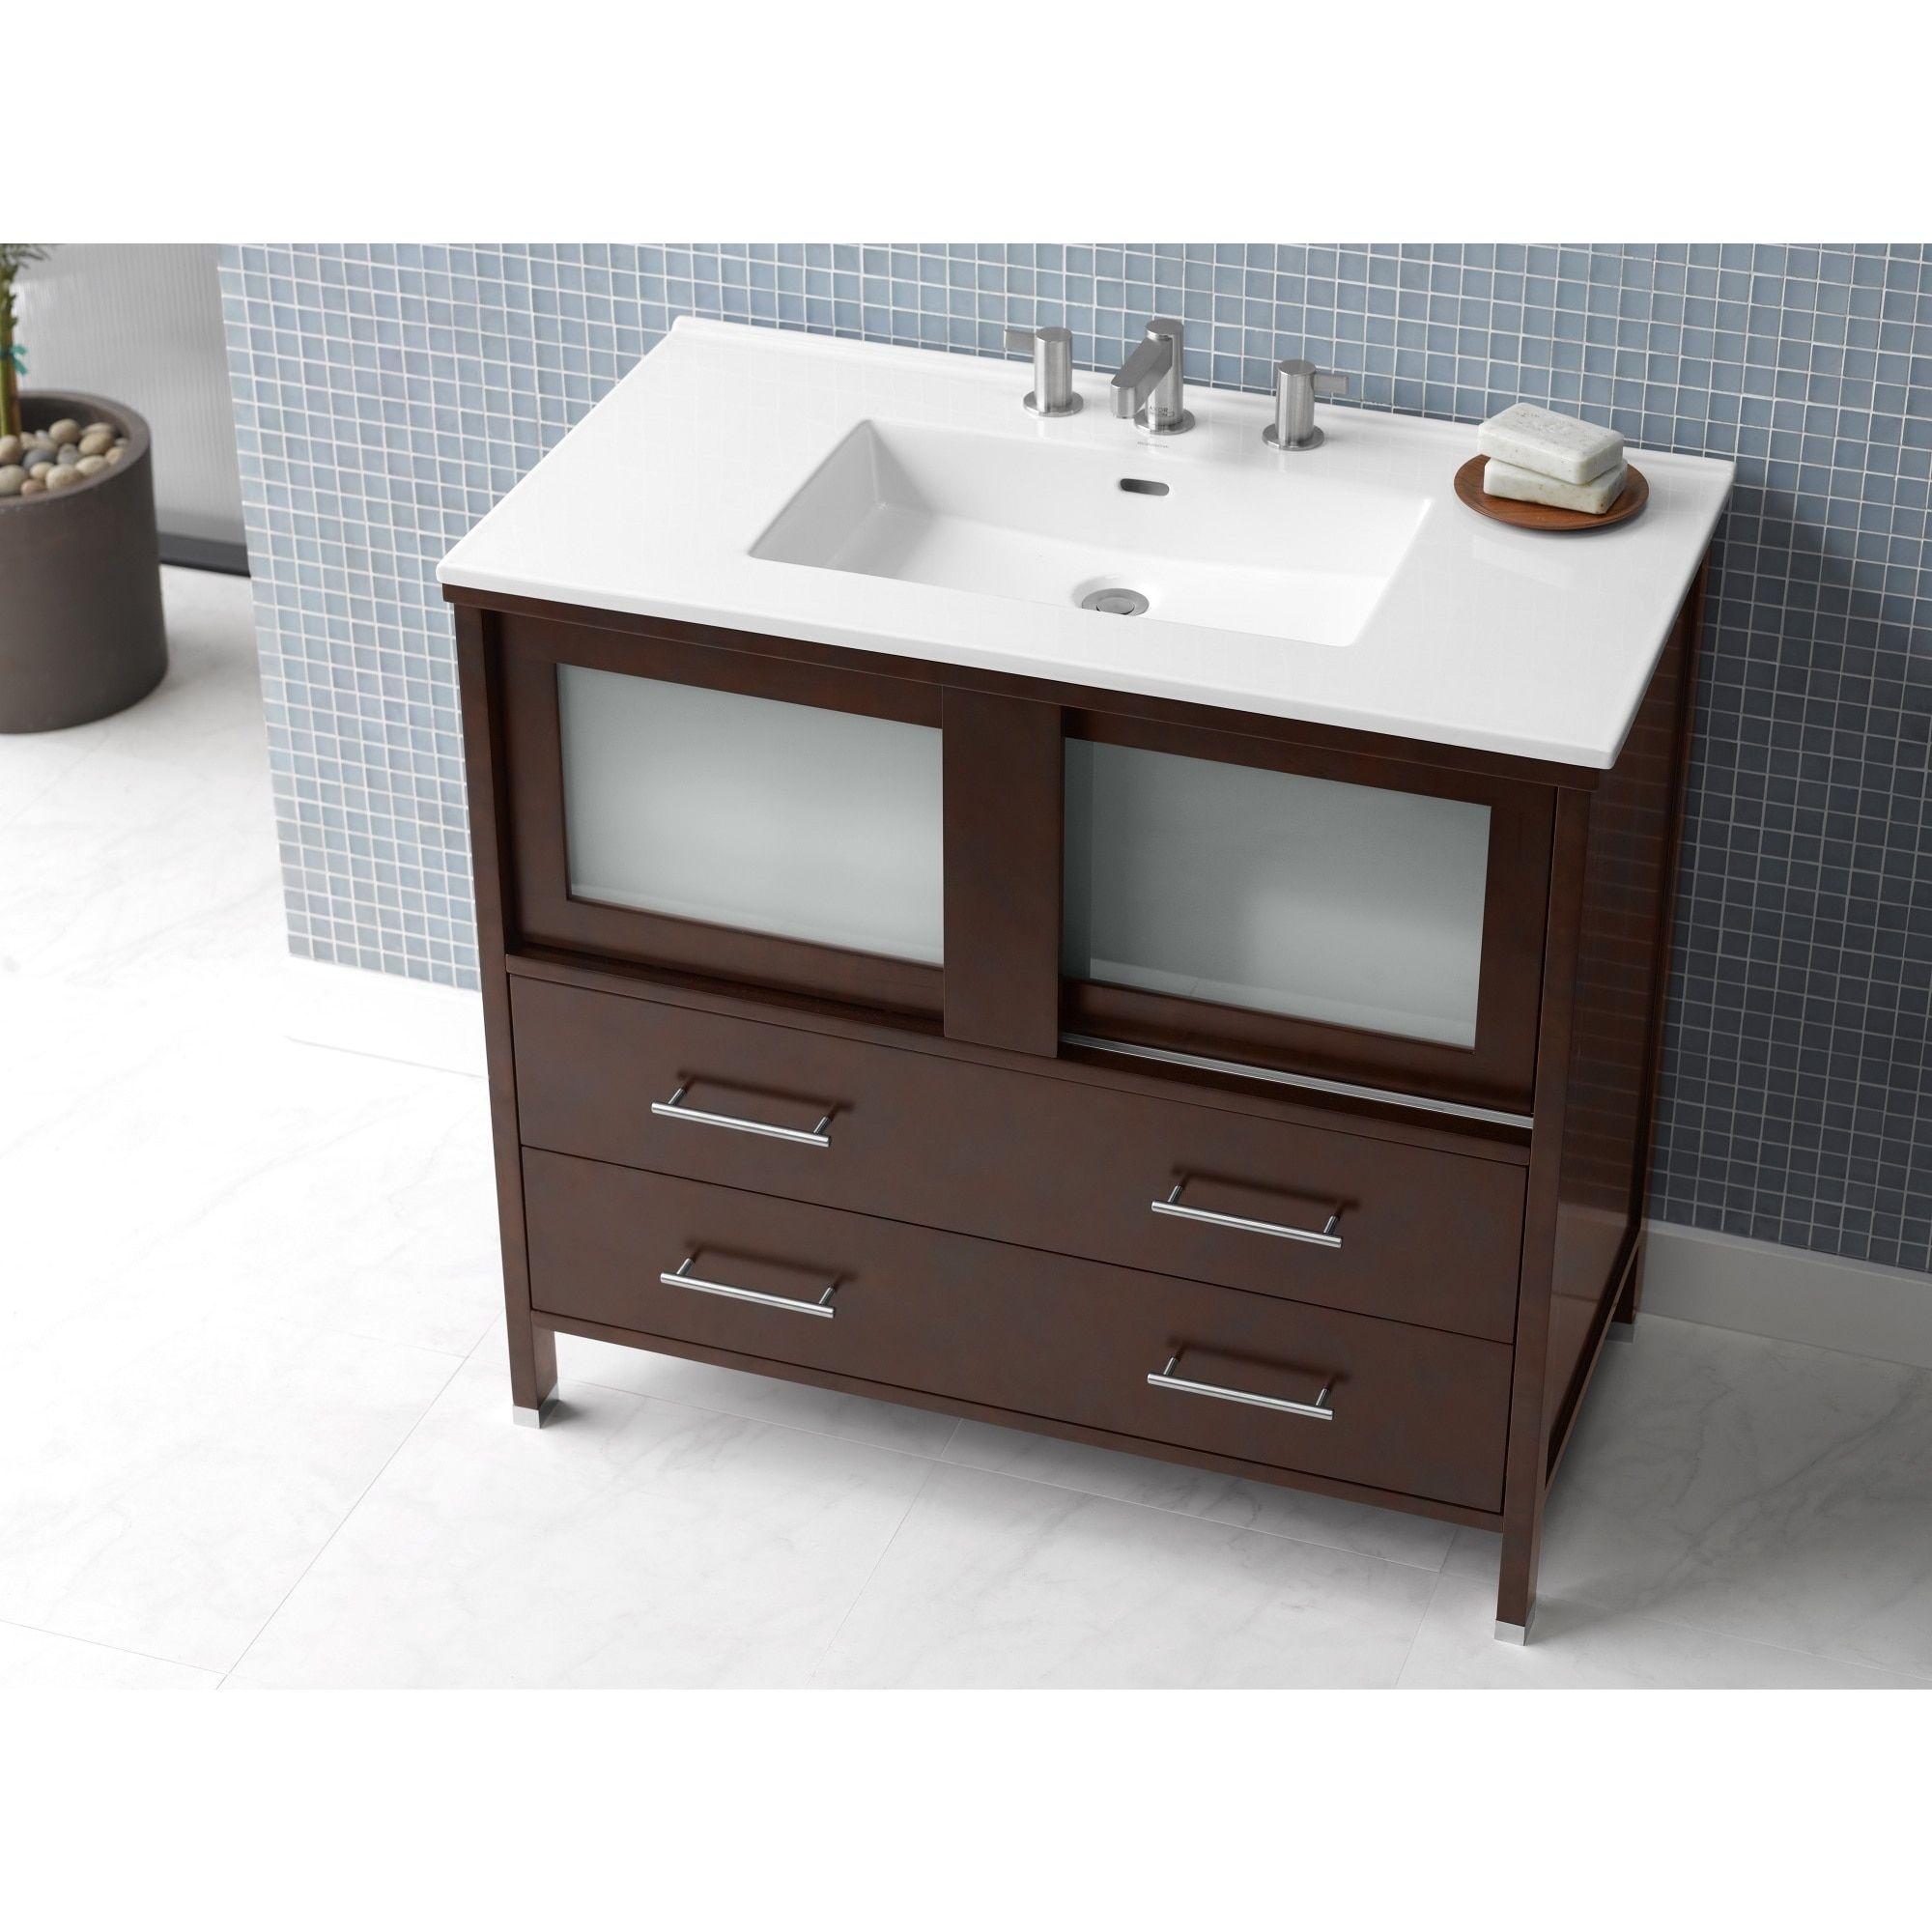 36 inch bathroom sink top - Ronbow Minerva 36 Inch Bathroom Vanity Set In Dark Cherry With Bathroom Sink Top In